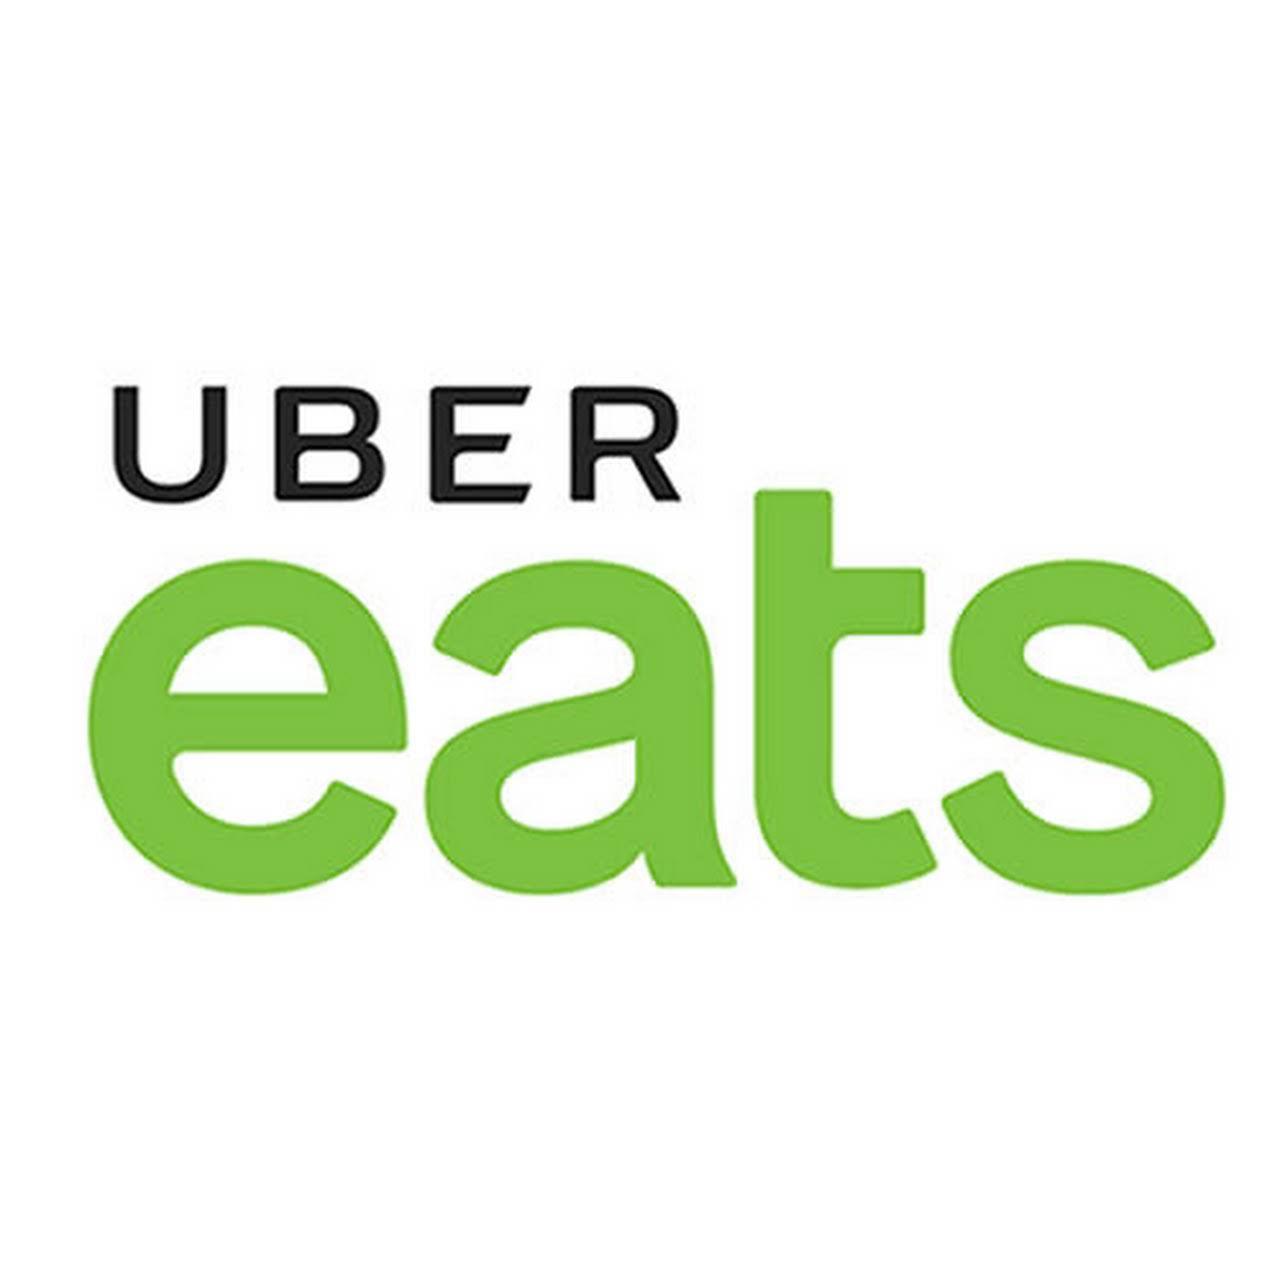 30% off your next order, maximum discount £25* using code (Account Specific /'Big Night In' London Restaurants) @ Uber Eats